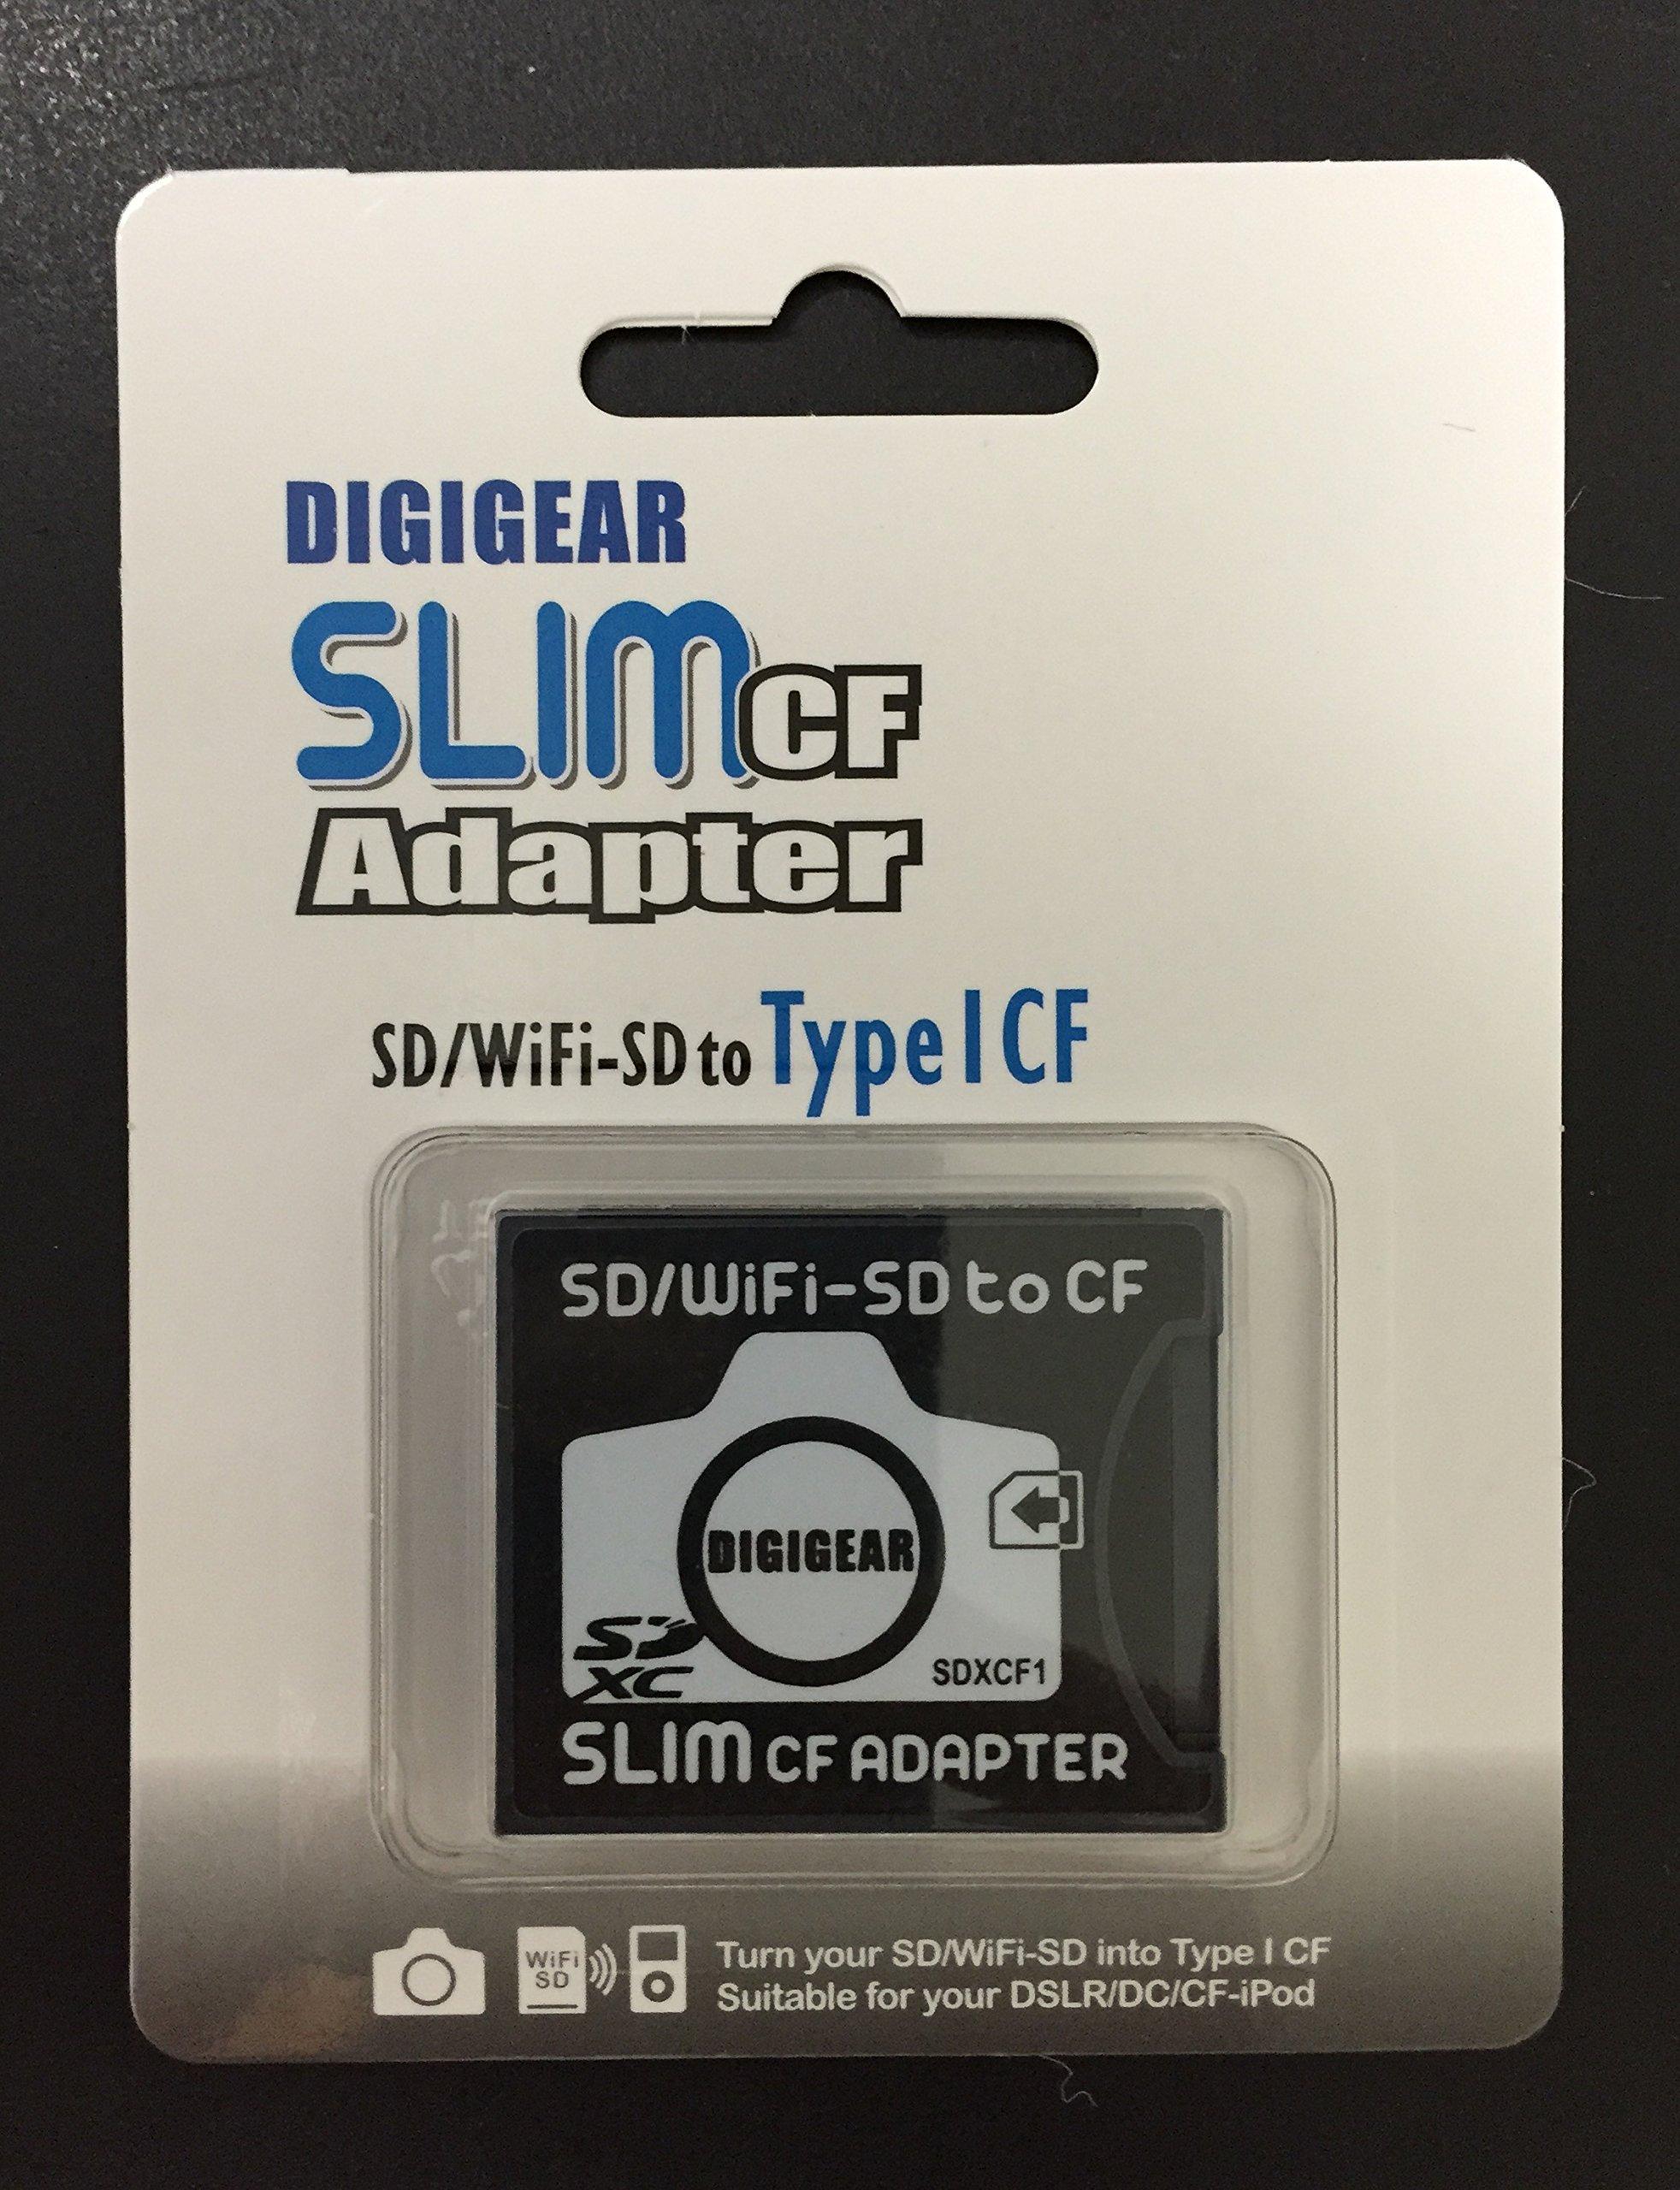 DIGIGEAR SLIM CF Adapter : SD SDHC SDXC WiFi-SD eyefi to Type I Compact Flash Card